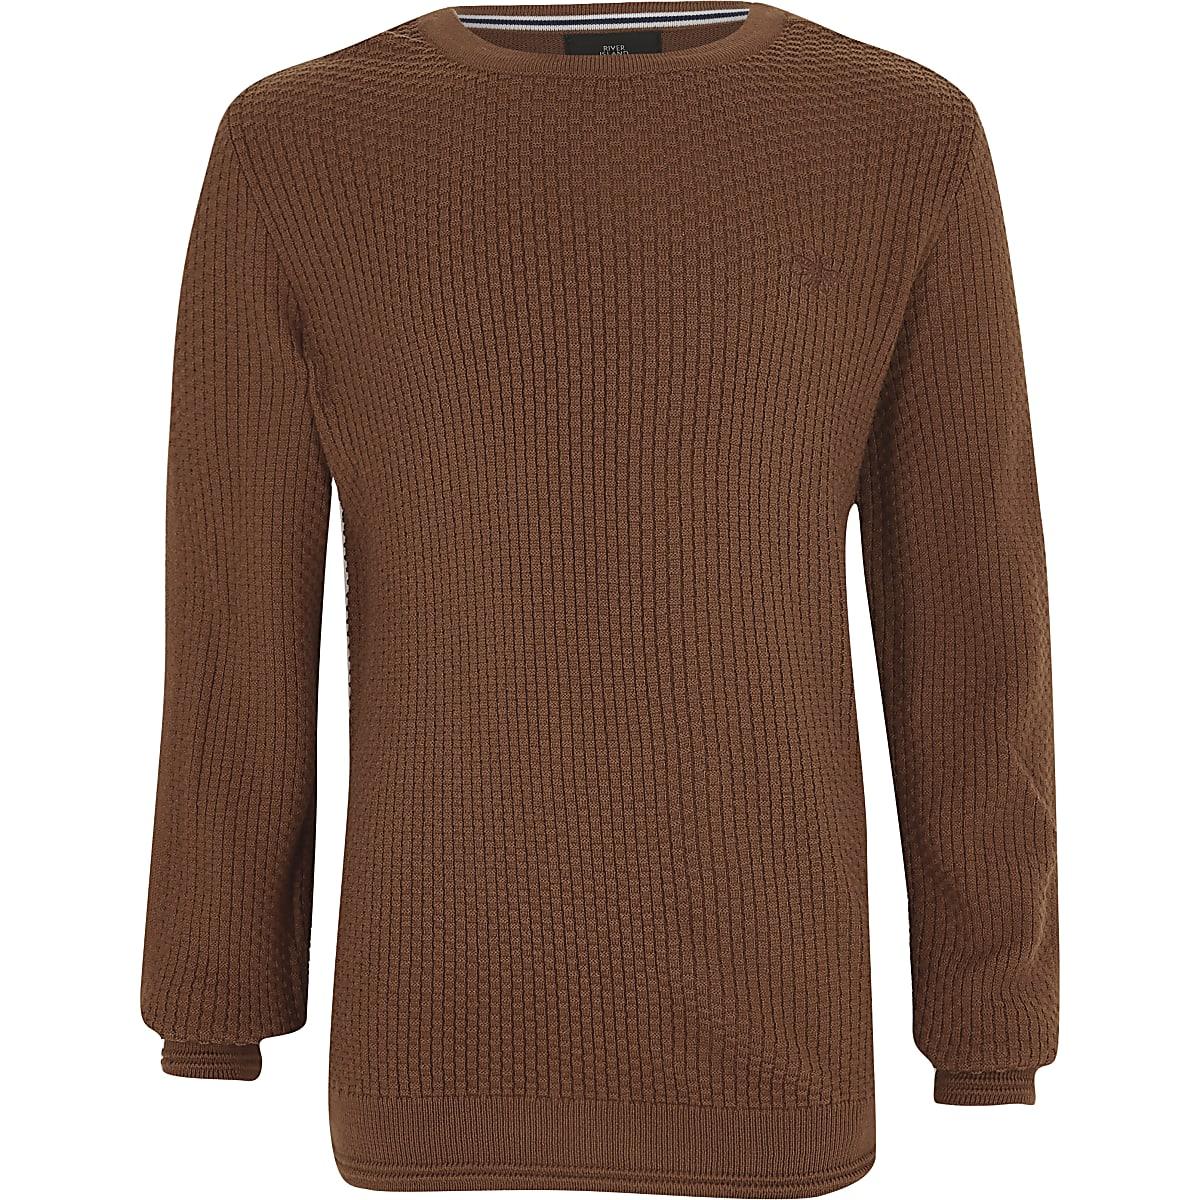 Boys brown textured jumper